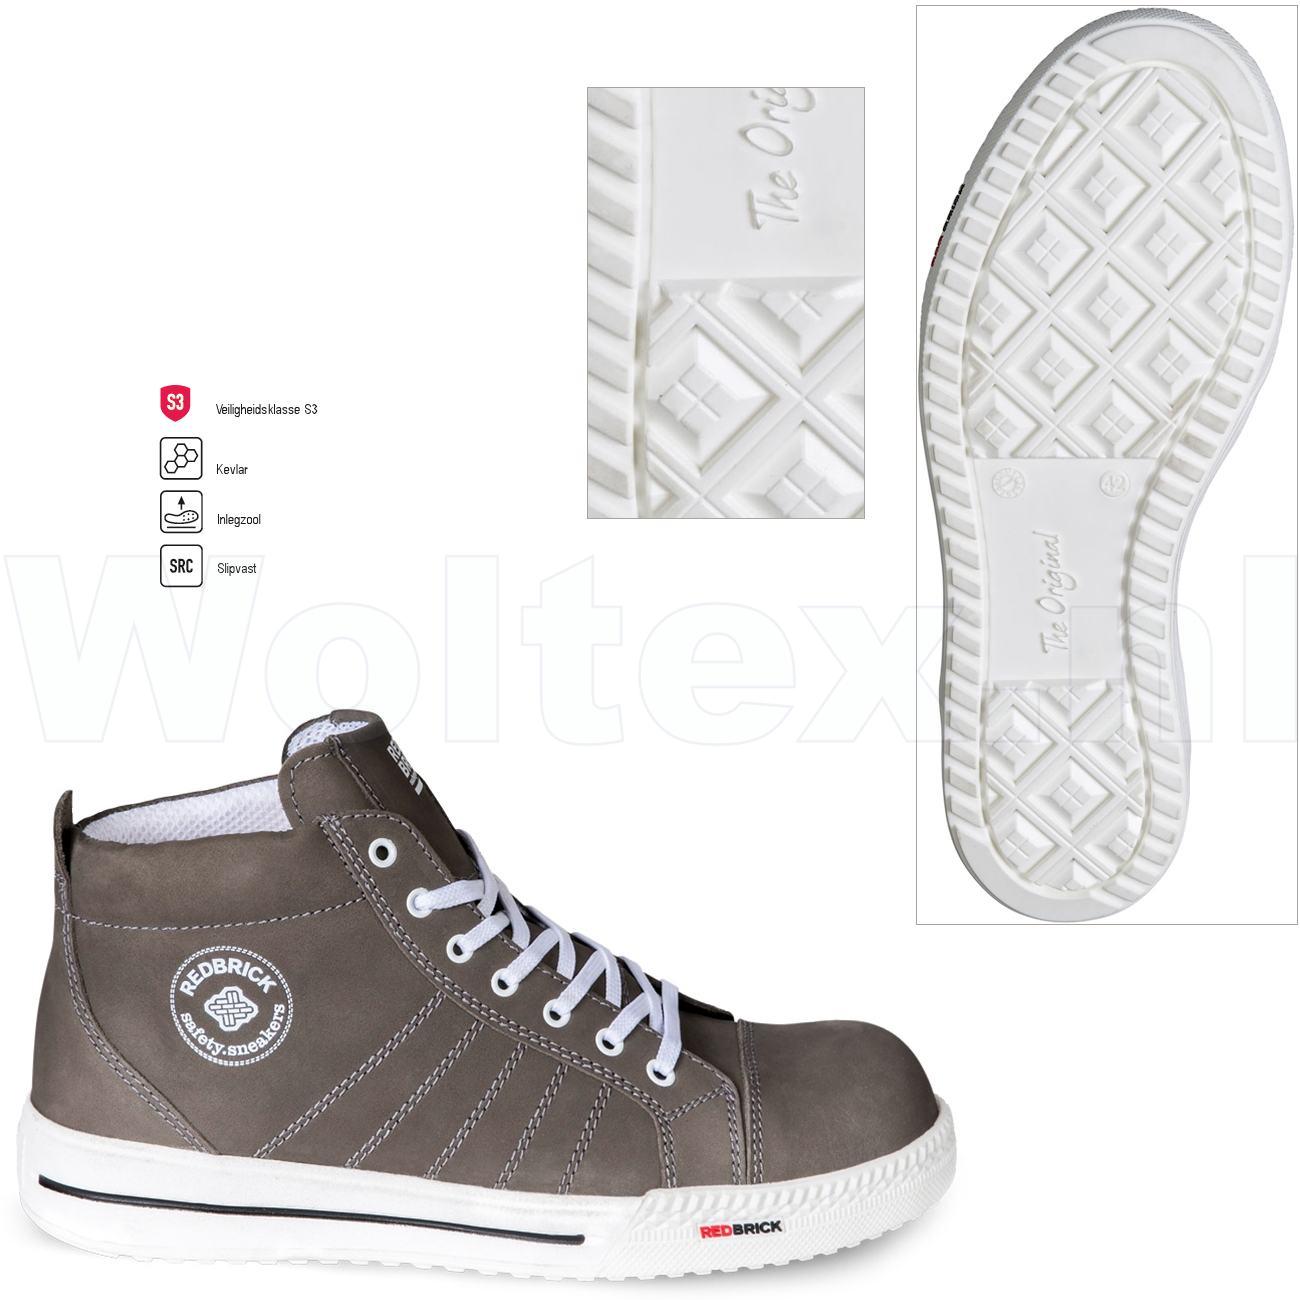 Redbrick Dames Werkschoenen.Redbrick Safety Sneakers Originals S3 Werkschoenen Jesper Taupe 39